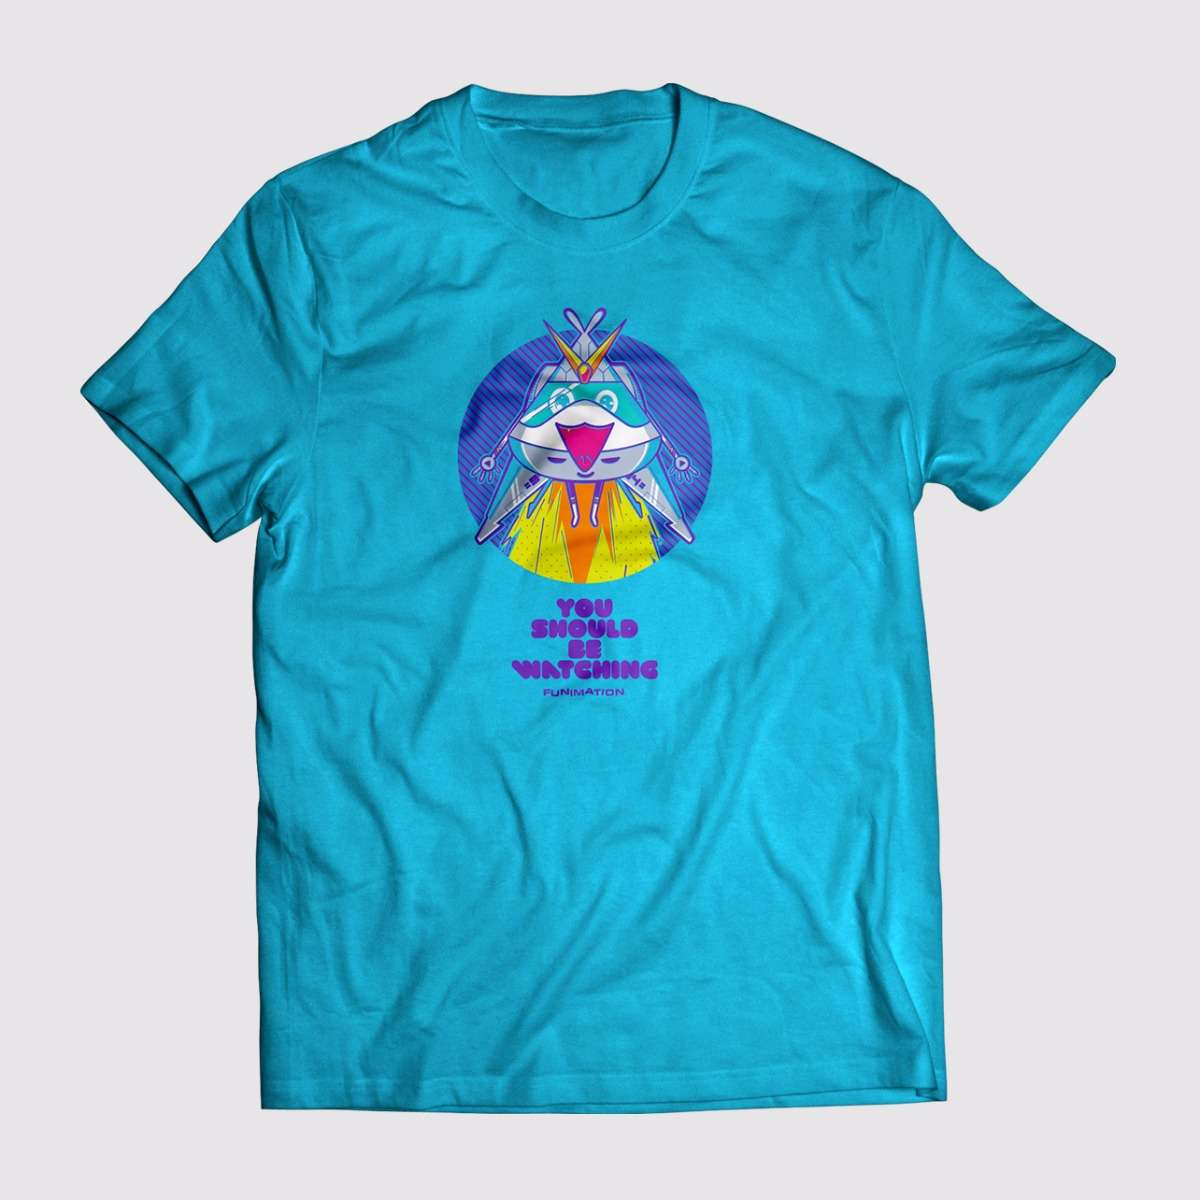 Funimation Merch T Shirt Blue Apparel